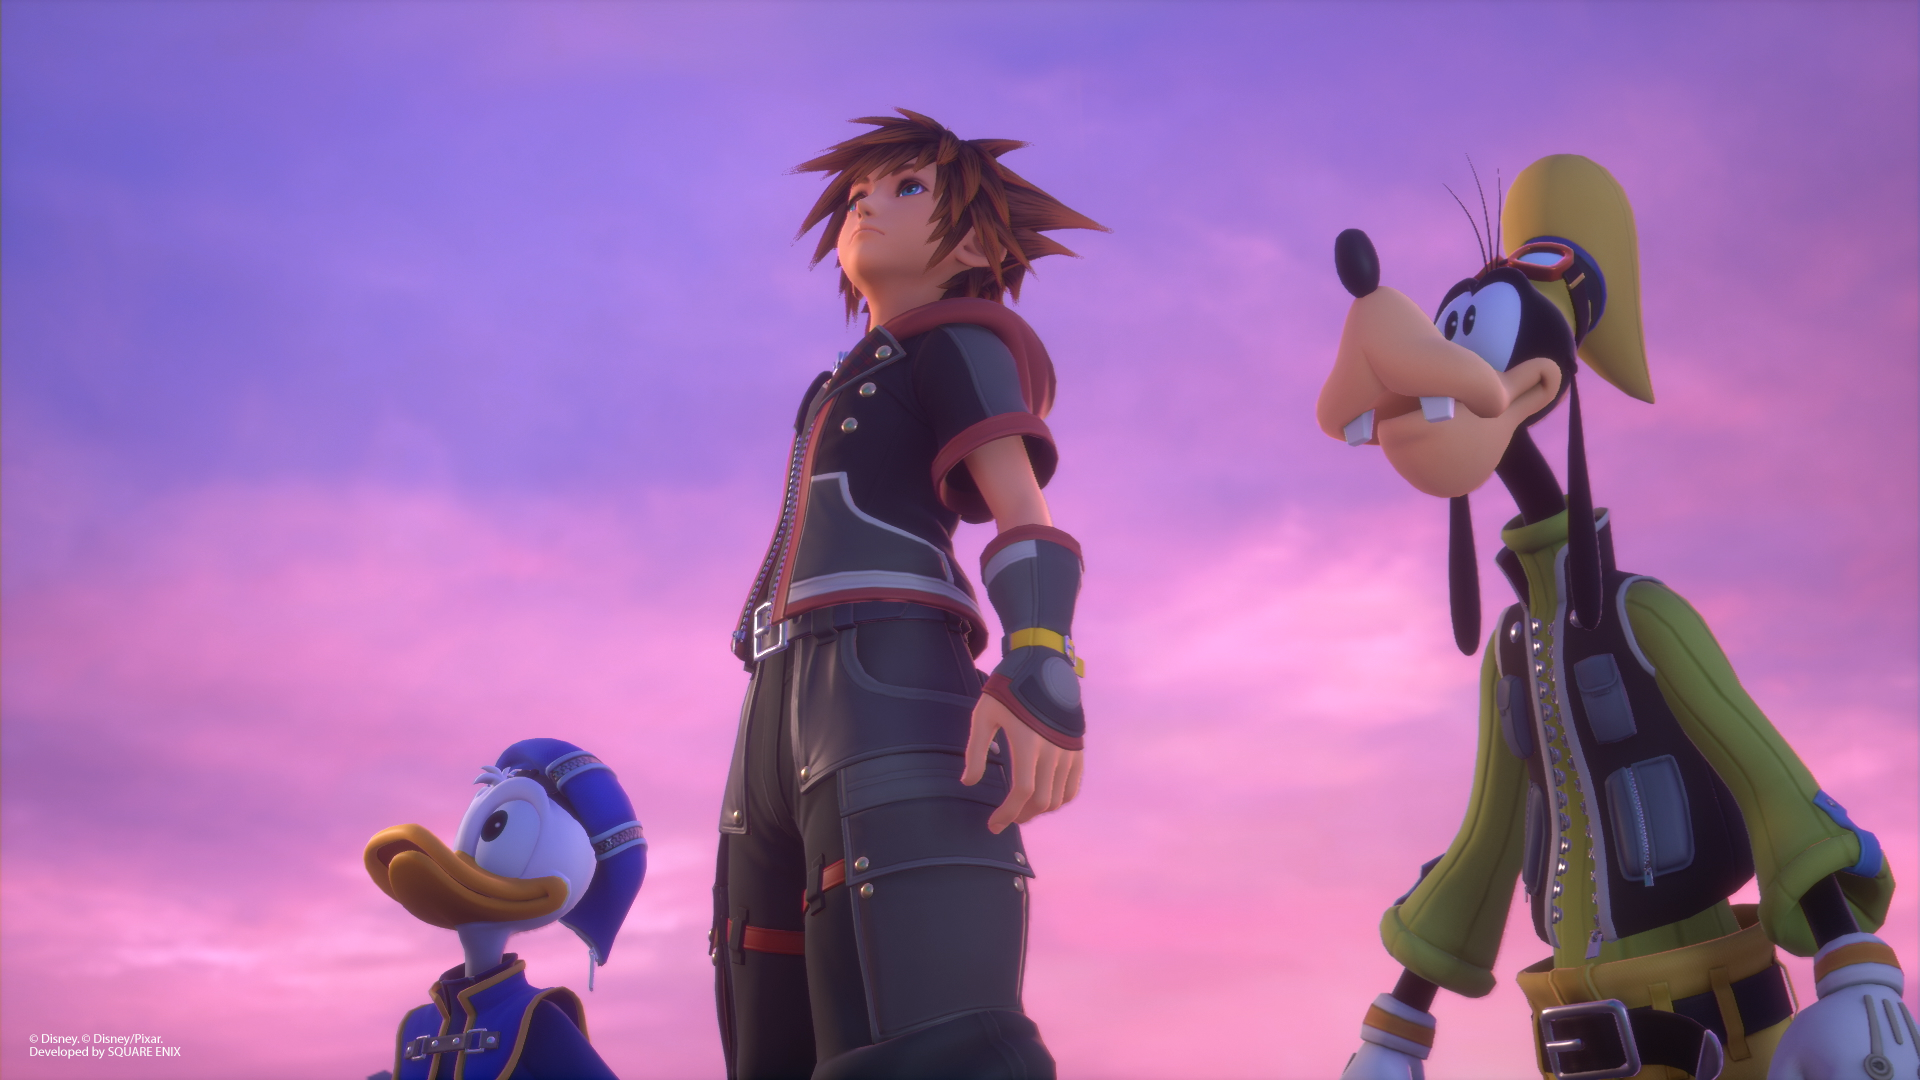 Kingdom Hearts 3 Pc Version Release Date When Will Sora And